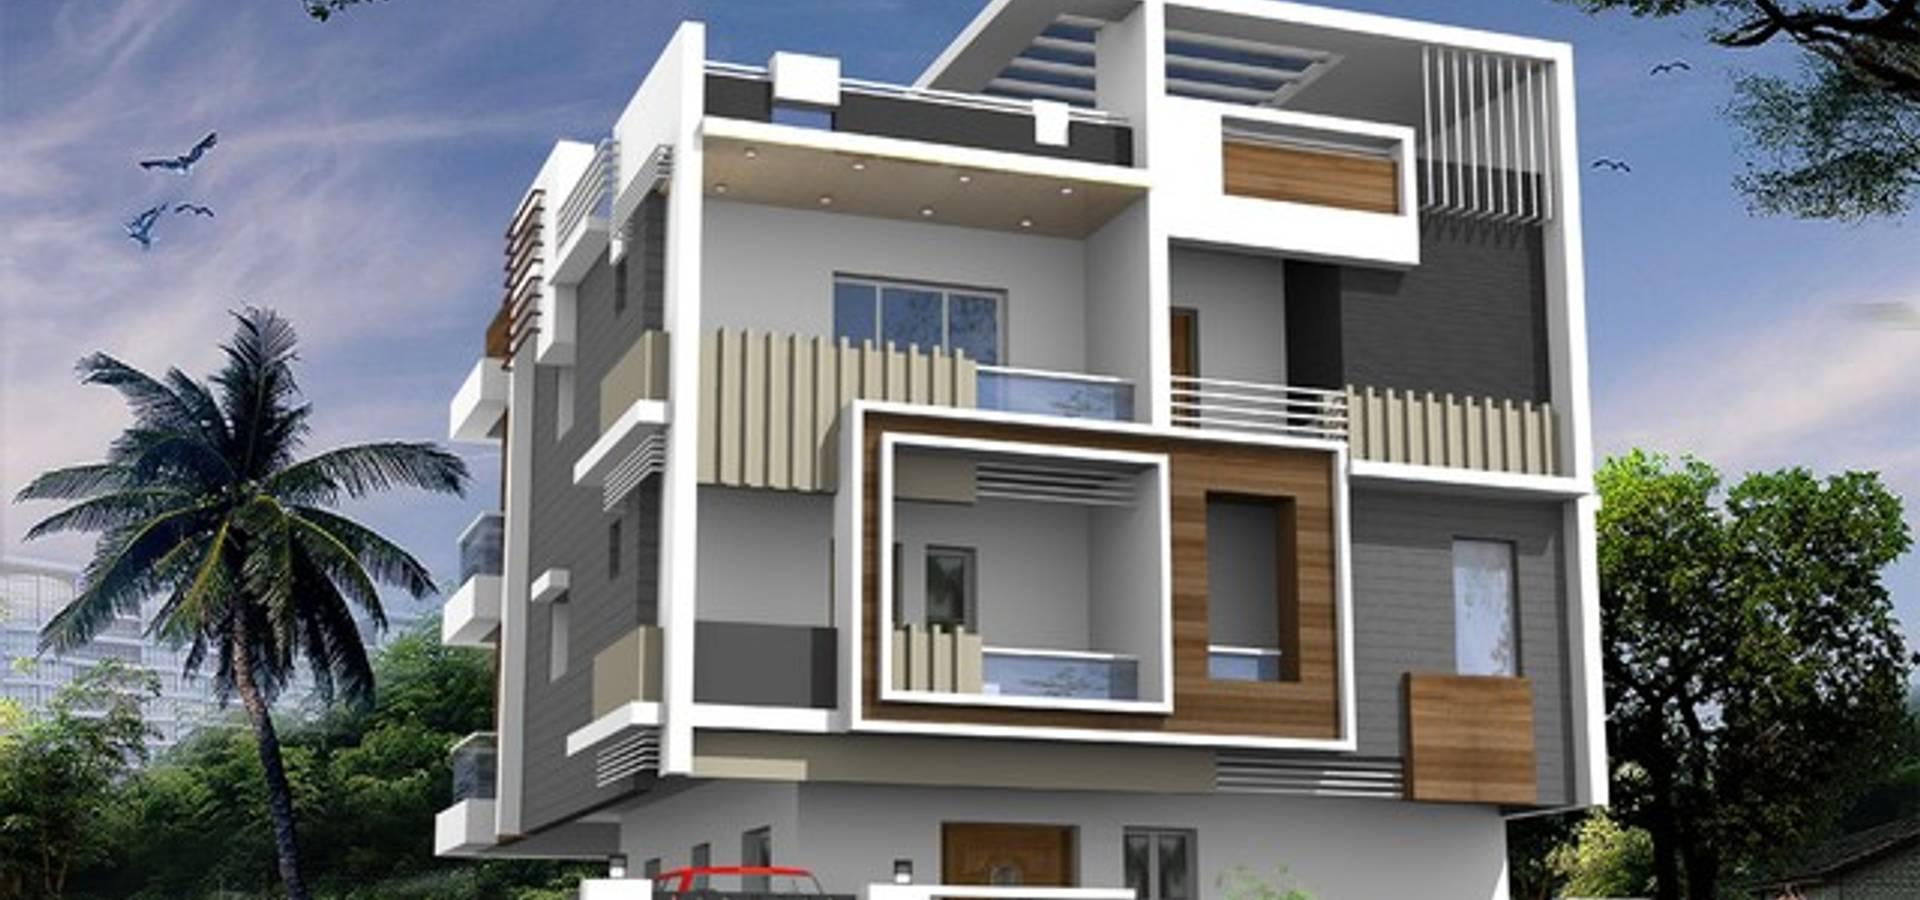 Inventive Architects